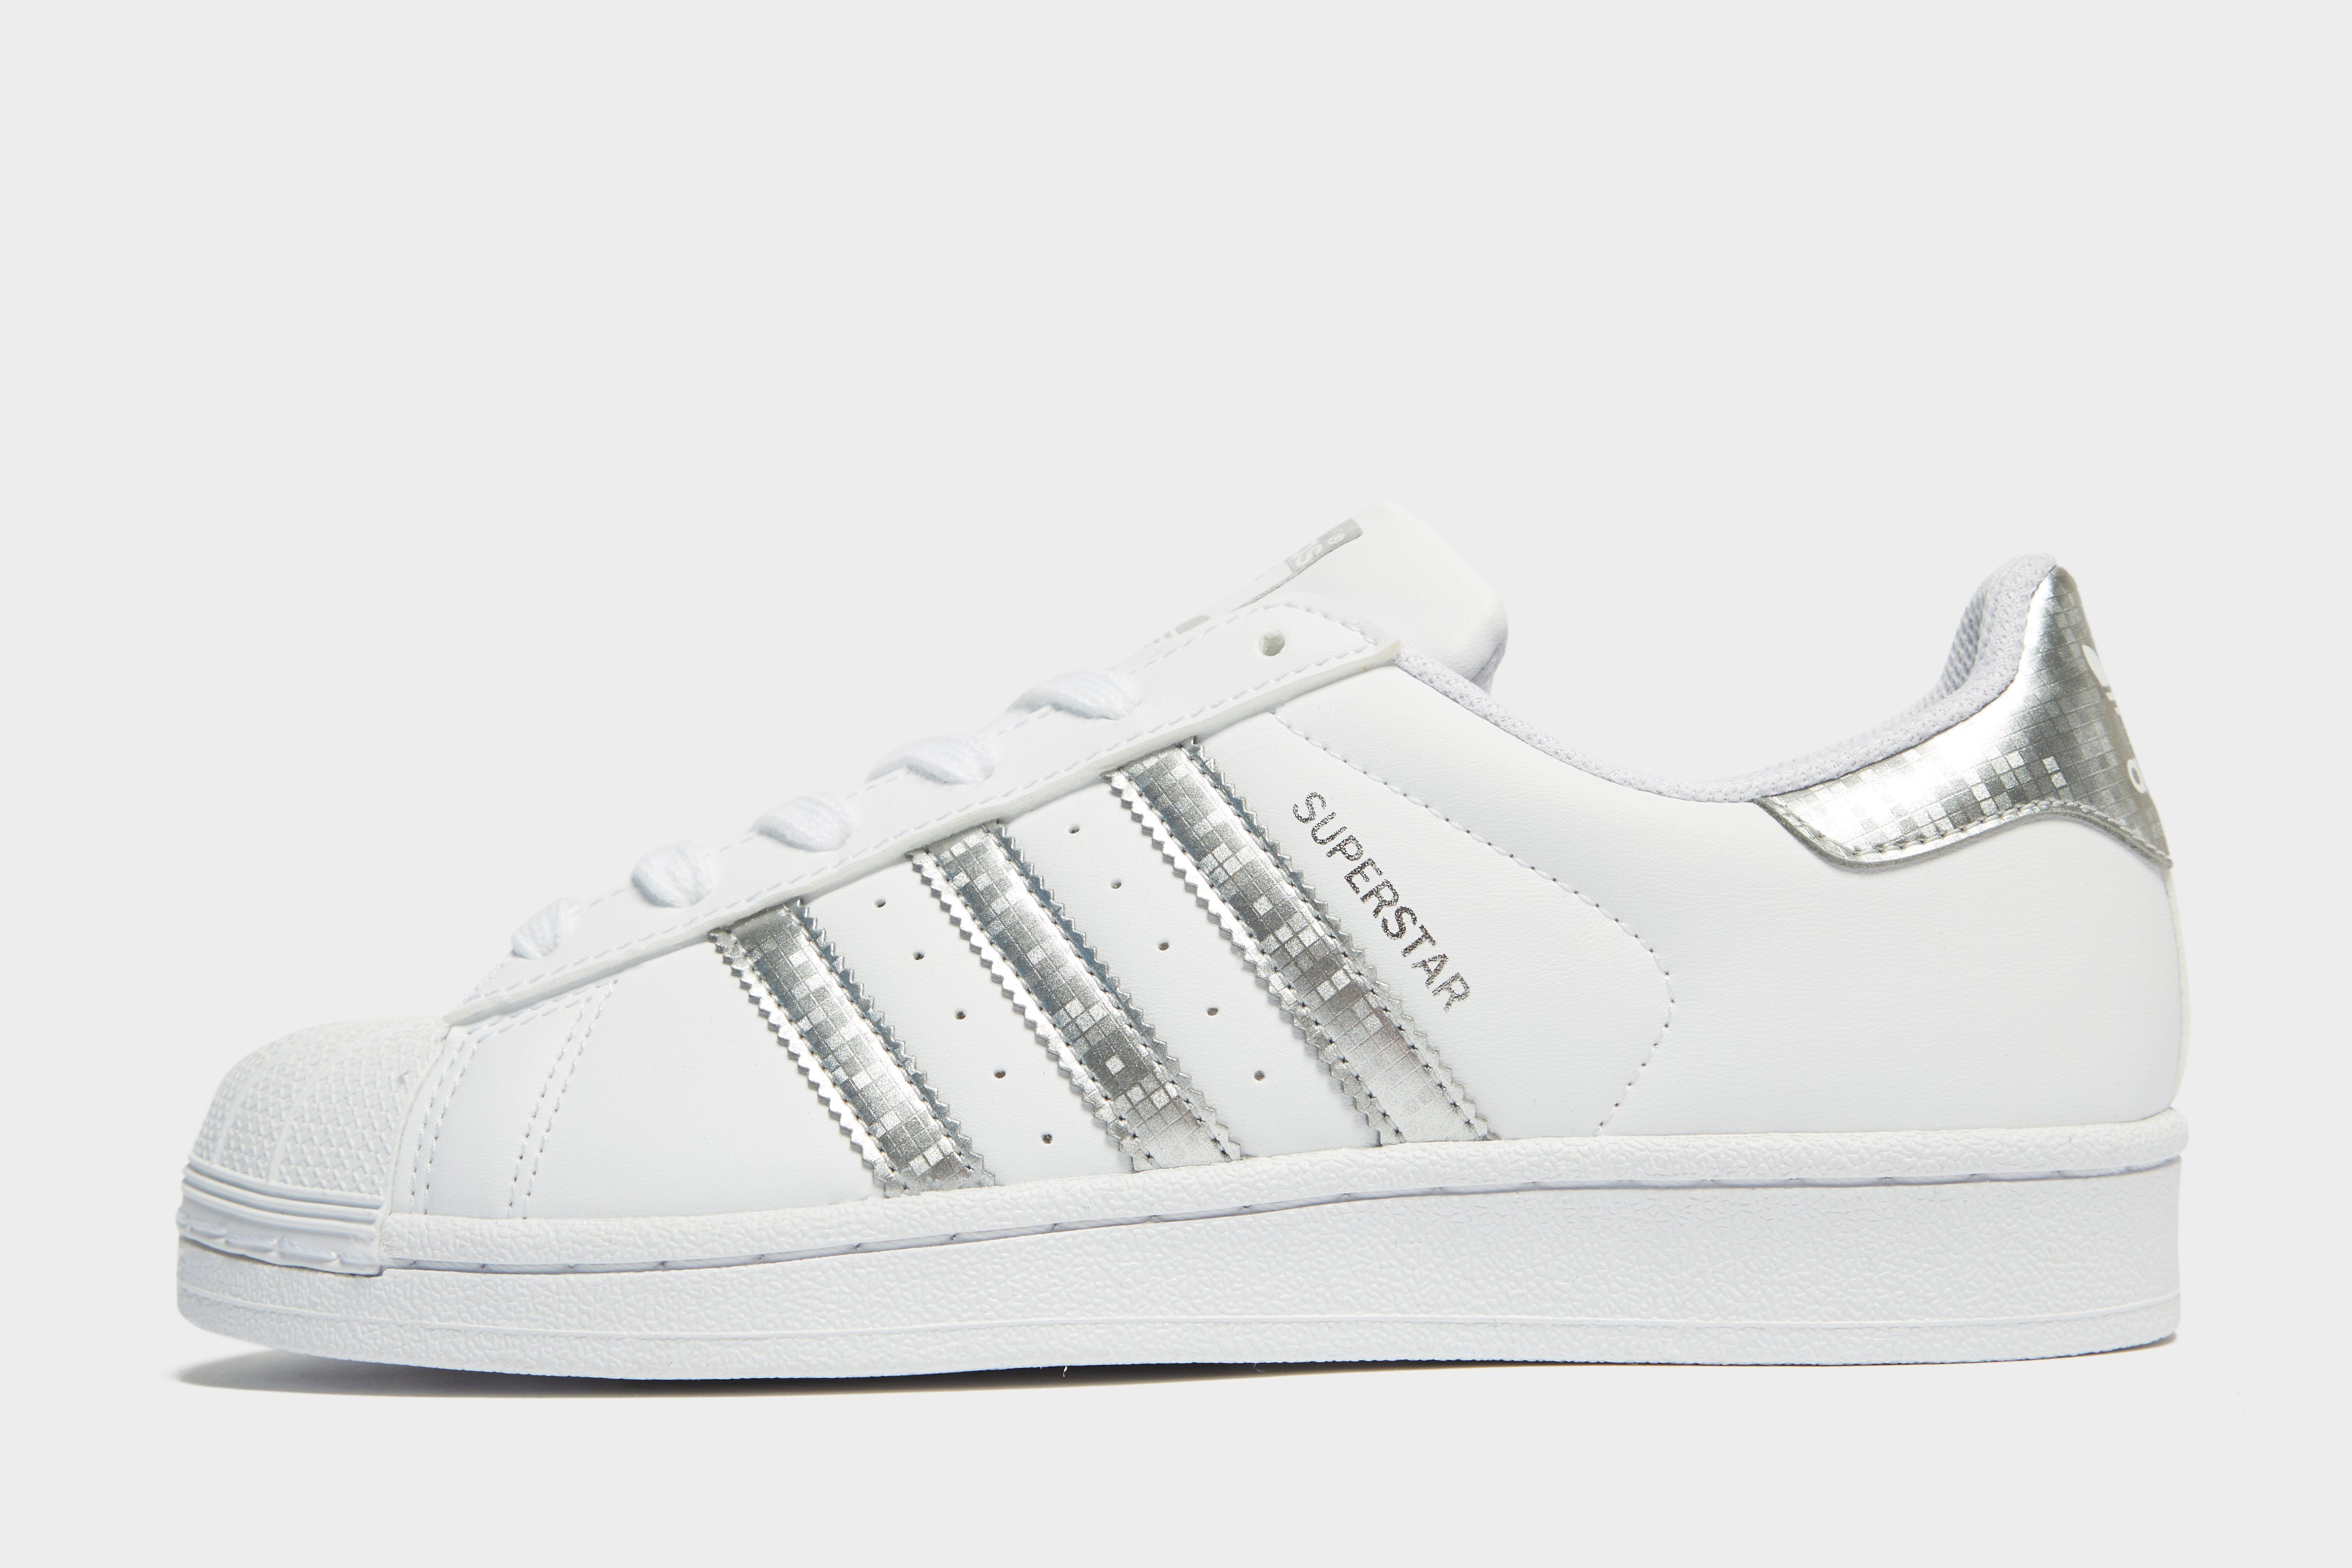 new style ca6cd 647cc adidas Originals Superstar Foundation Shoes   JD Sports